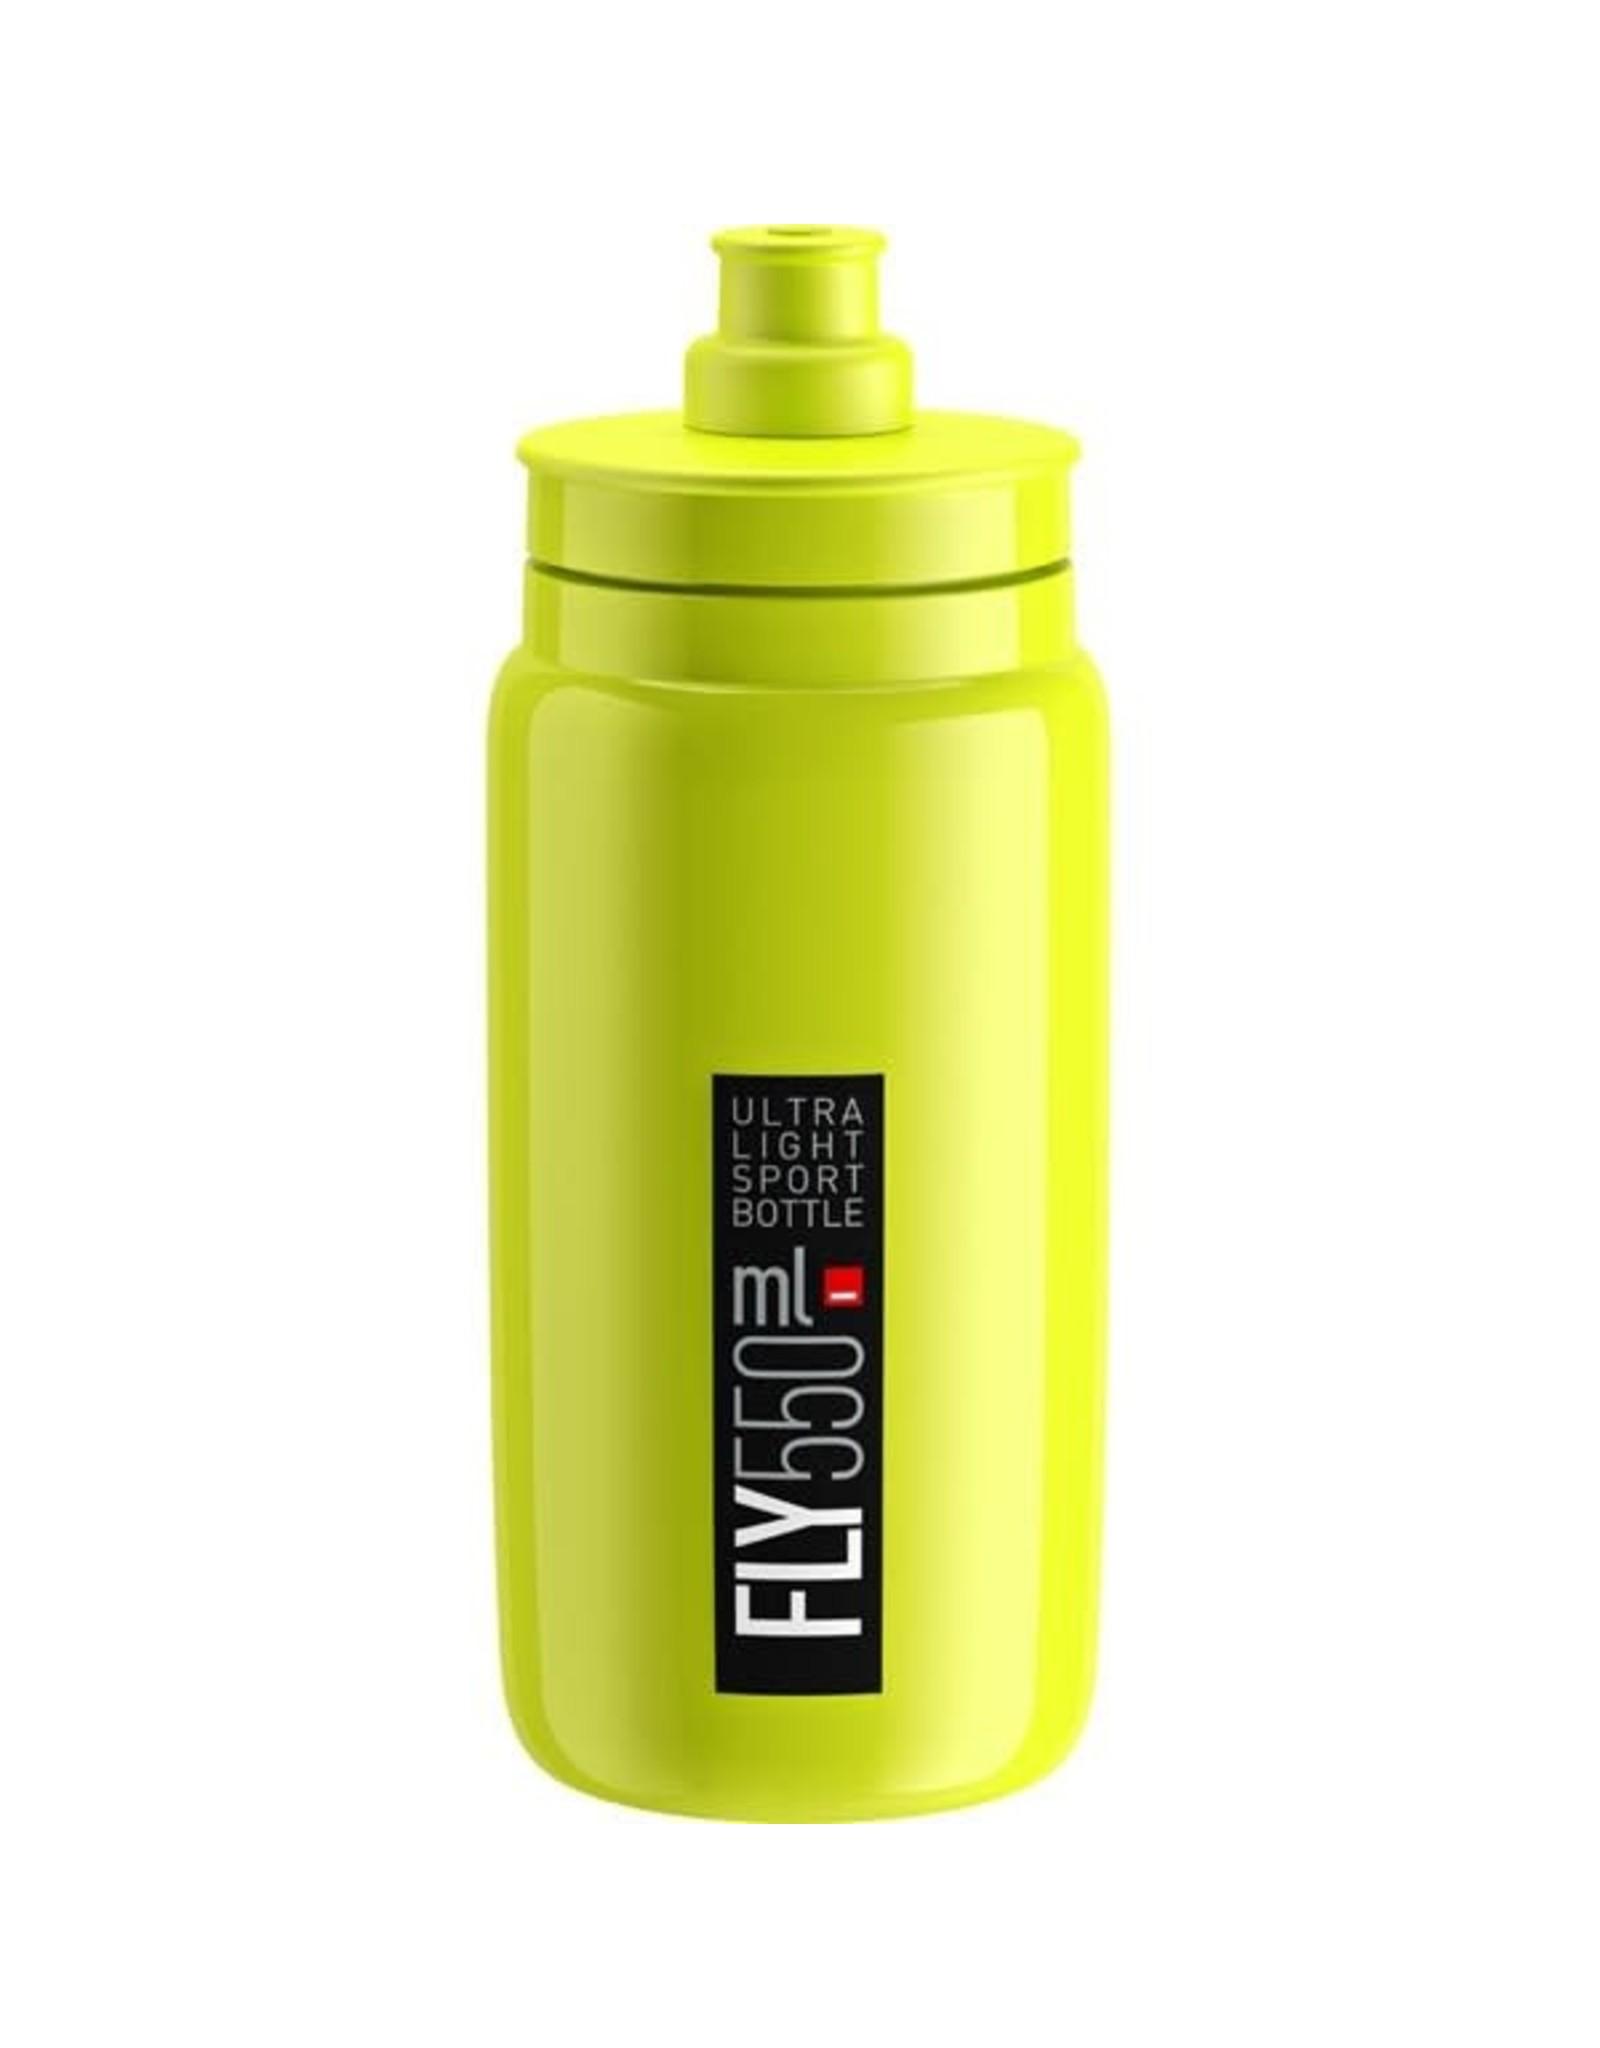 Elite FLY H2O BOTTLE FLUORESCENT YELLOW W/ BLACK LOGO 550ml